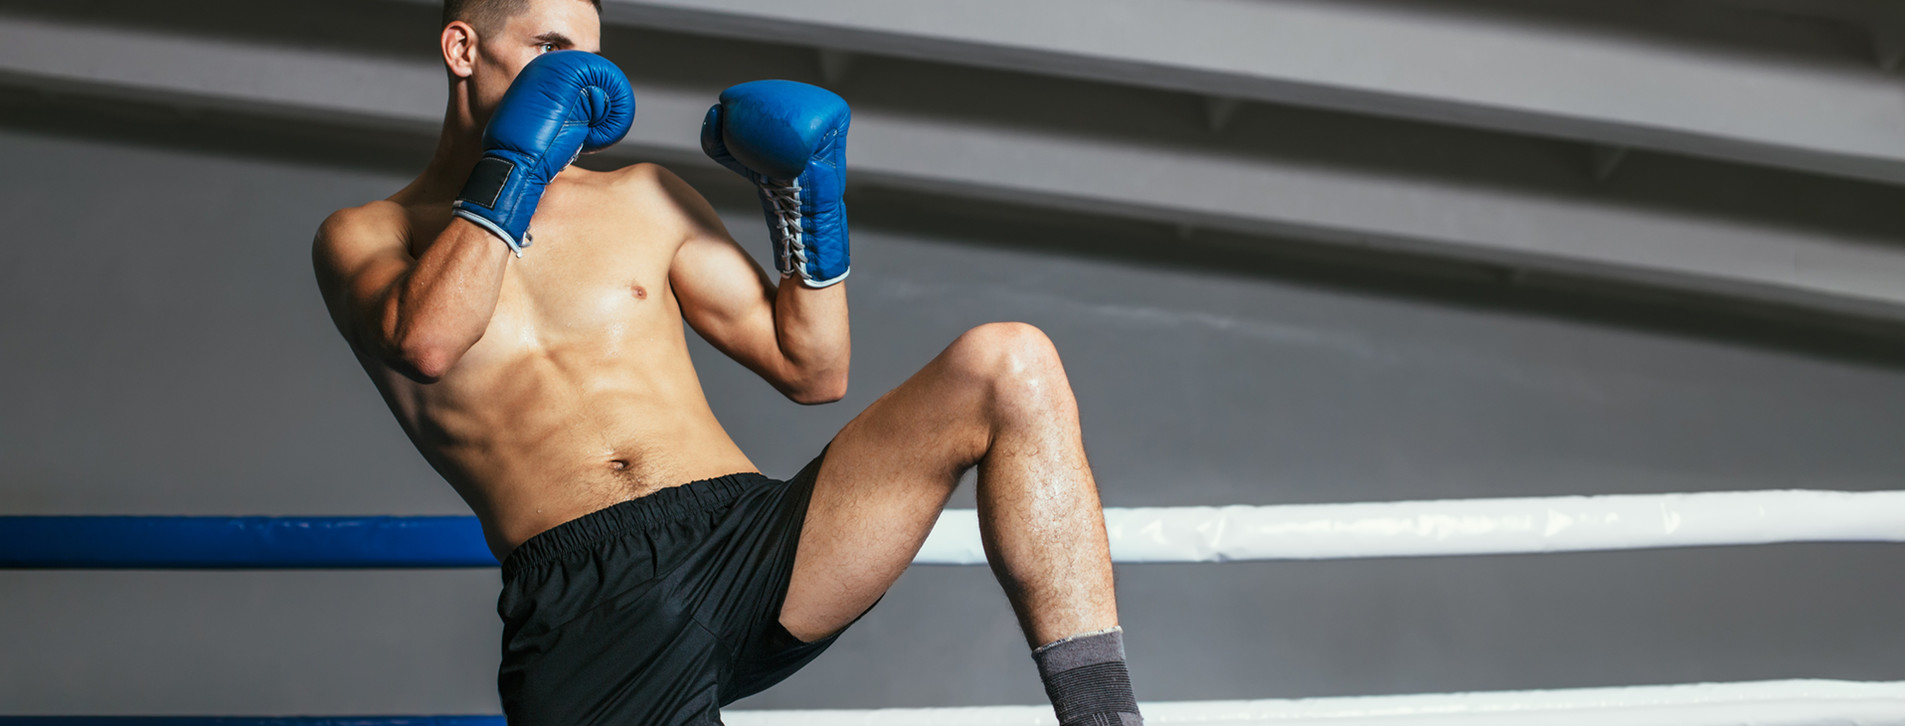 Фото 1 - Мастер-класс тайского бокса